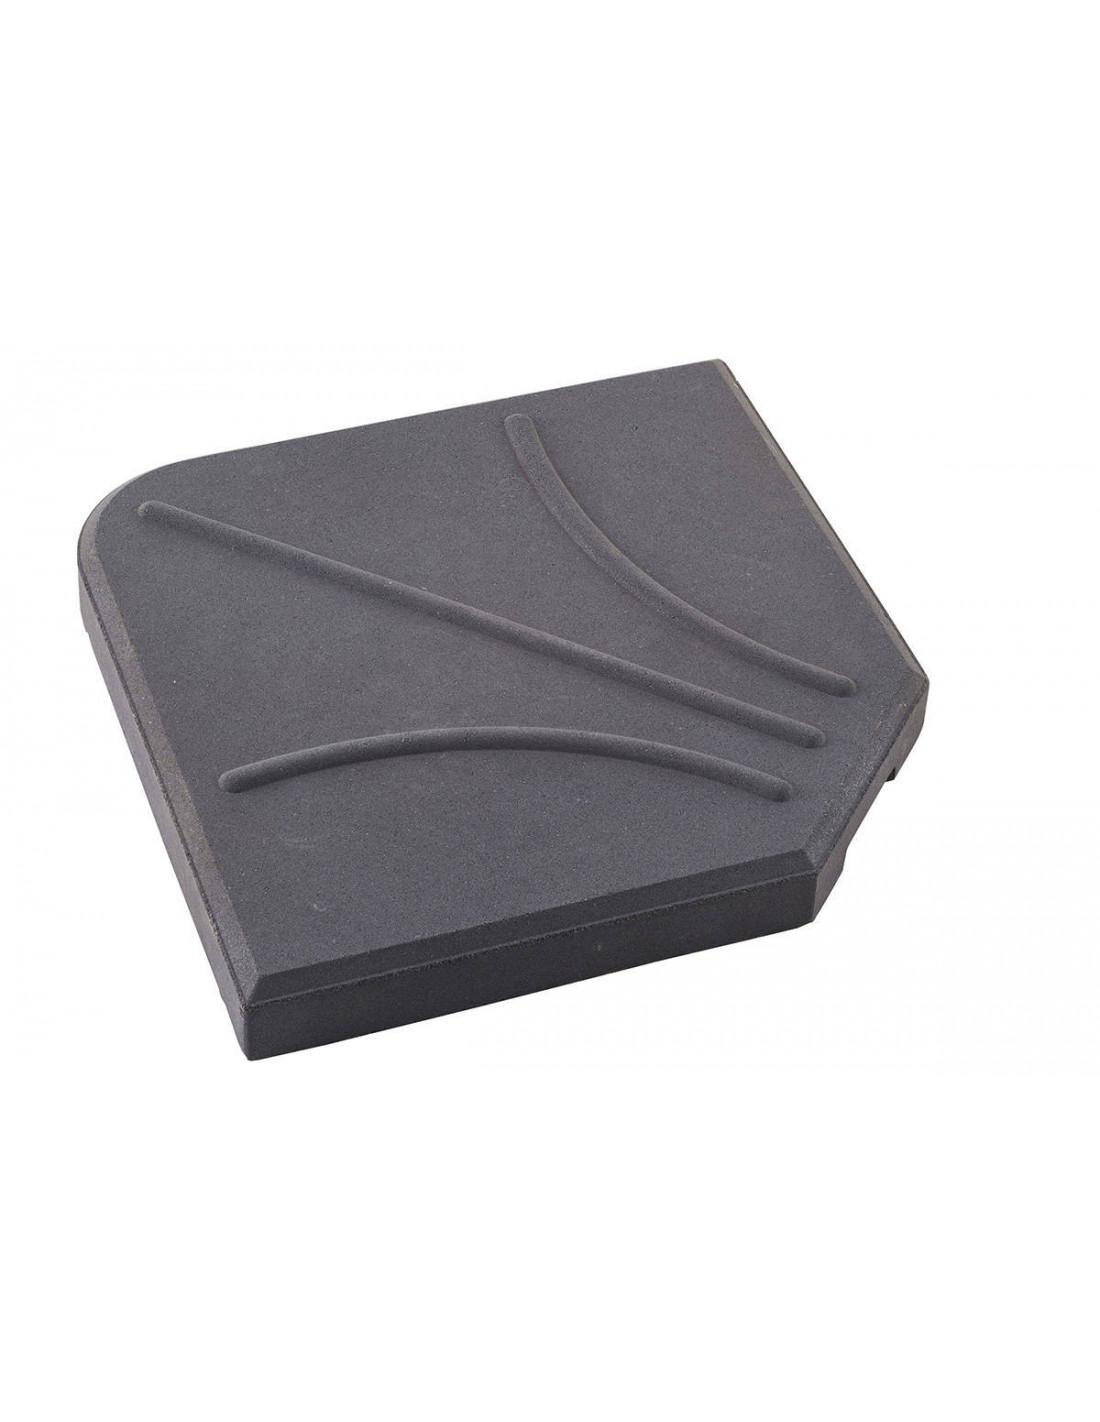 dalle pour parasol d port 25kg ciment hesp ride. Black Bedroom Furniture Sets. Home Design Ideas